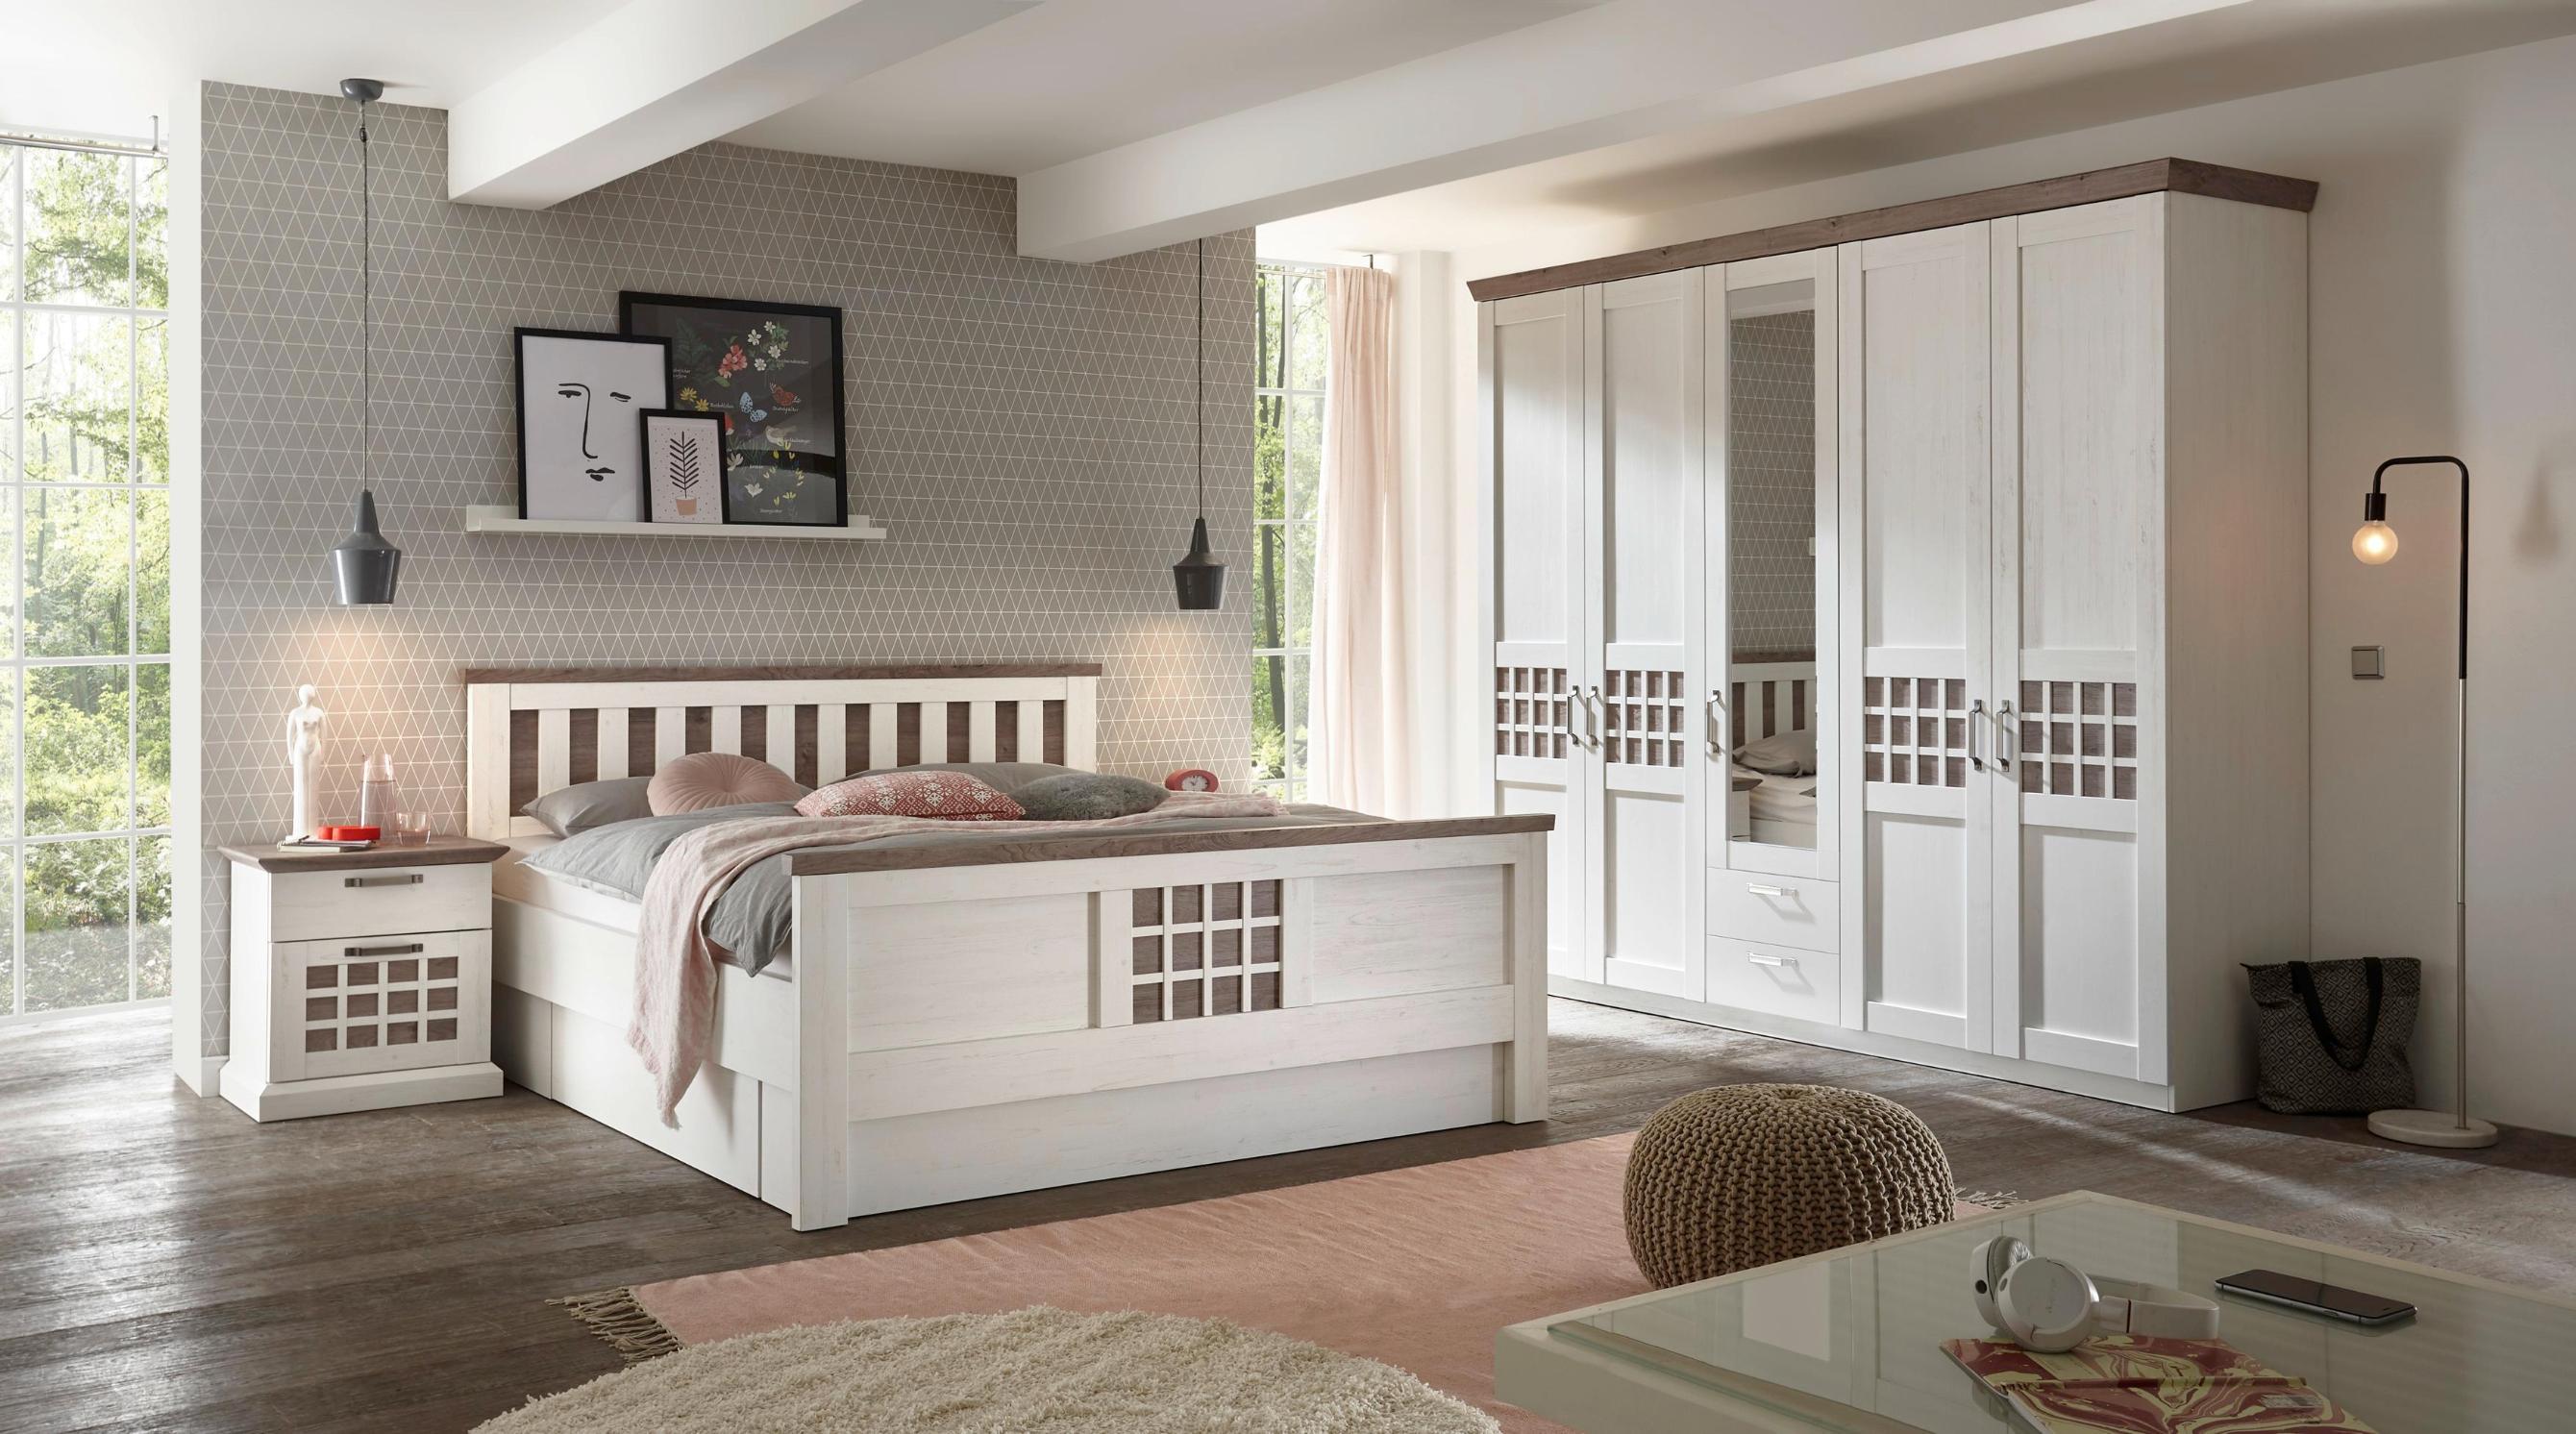 Spavaća soba Savona, krevet 200x180 cm, s dva noćna 4.999,00 kn, ormar  256x225x61 cm, 5.999,00 kn, 12980017-01-M01